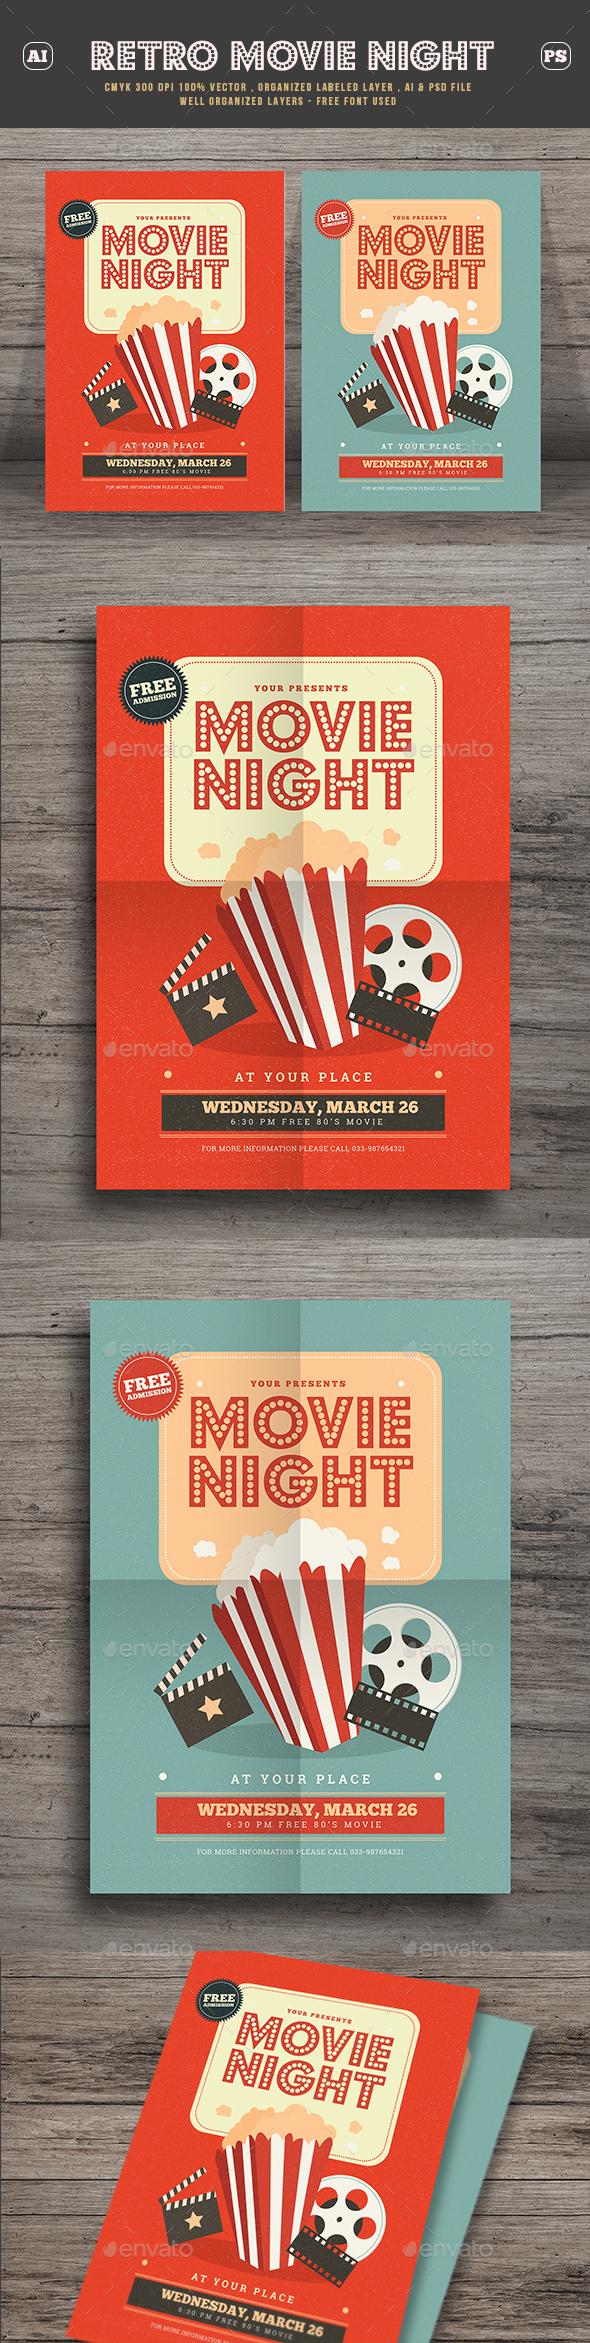 Retro Movie Festival Flyer - Events Flyers